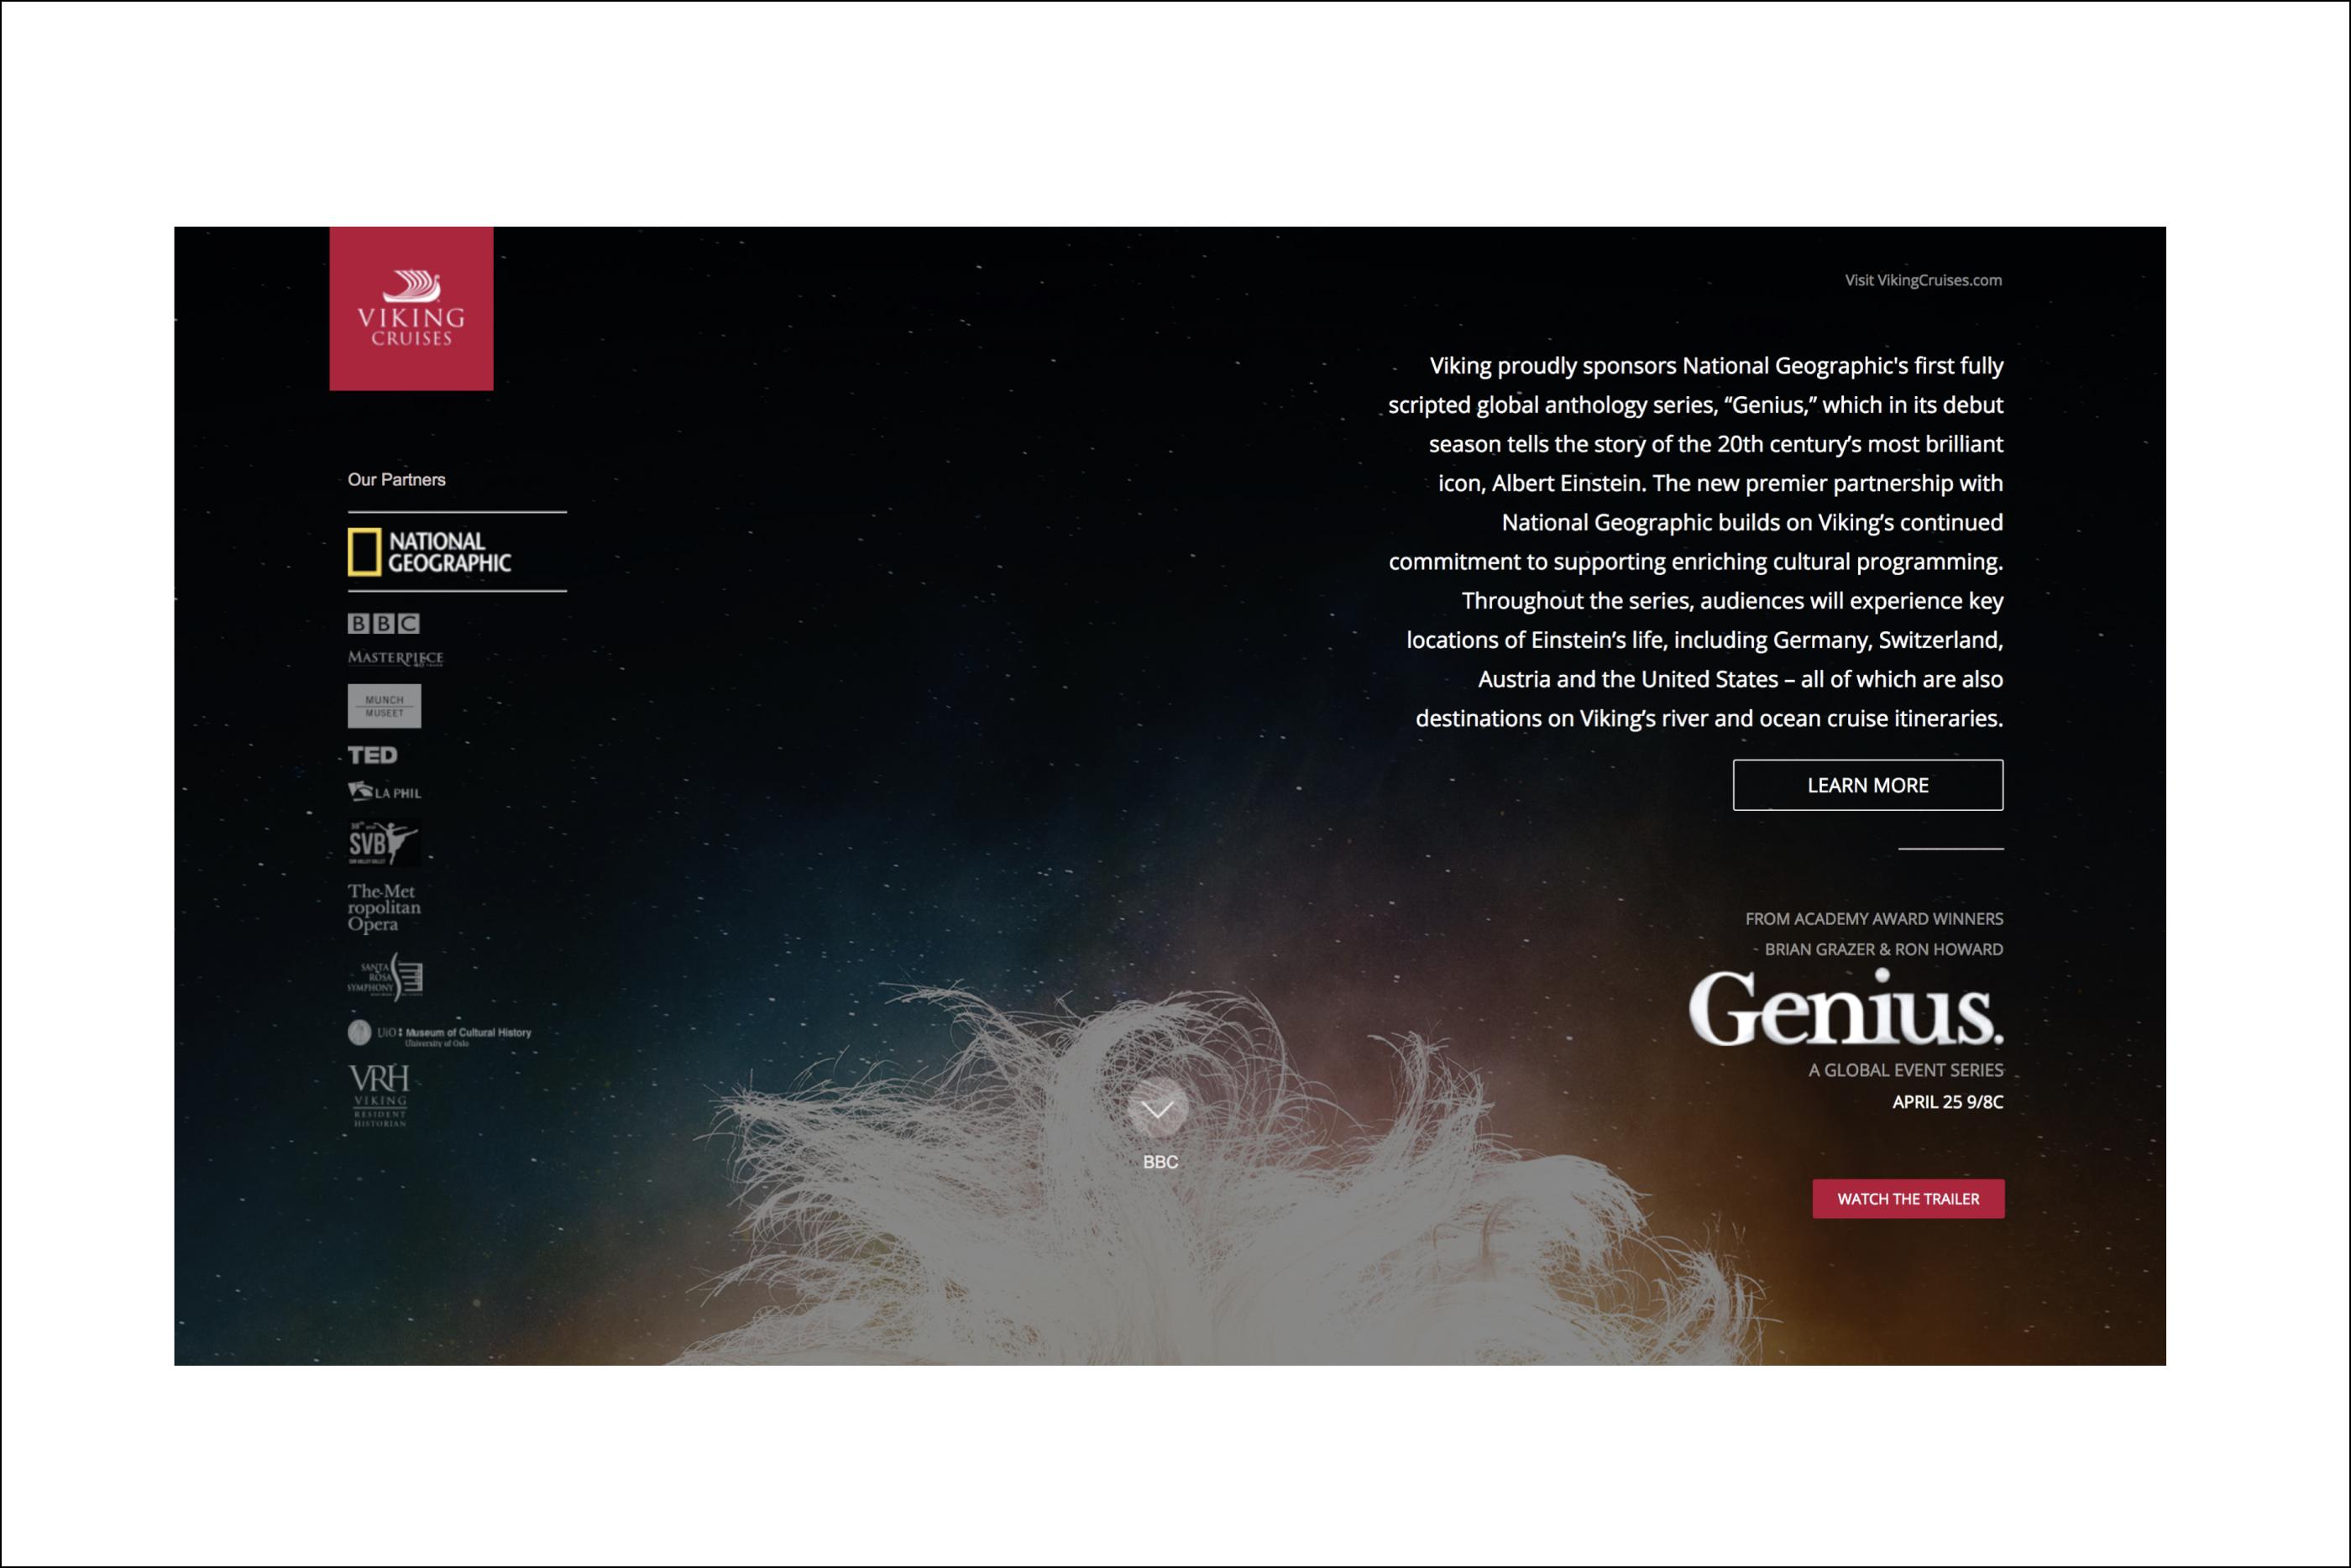 landing page of website